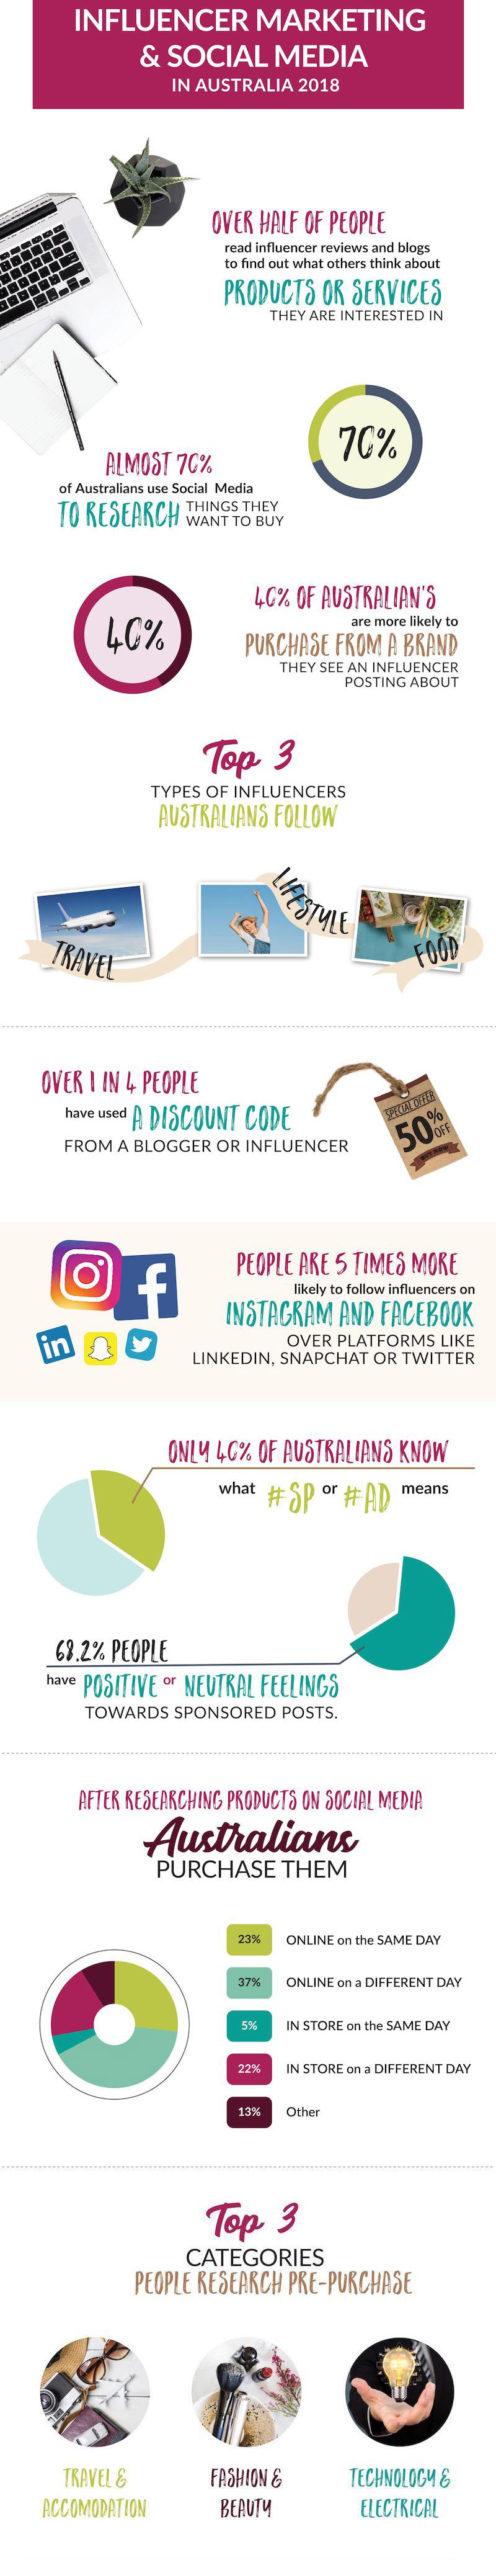 statistics influencer marketing australia infographic